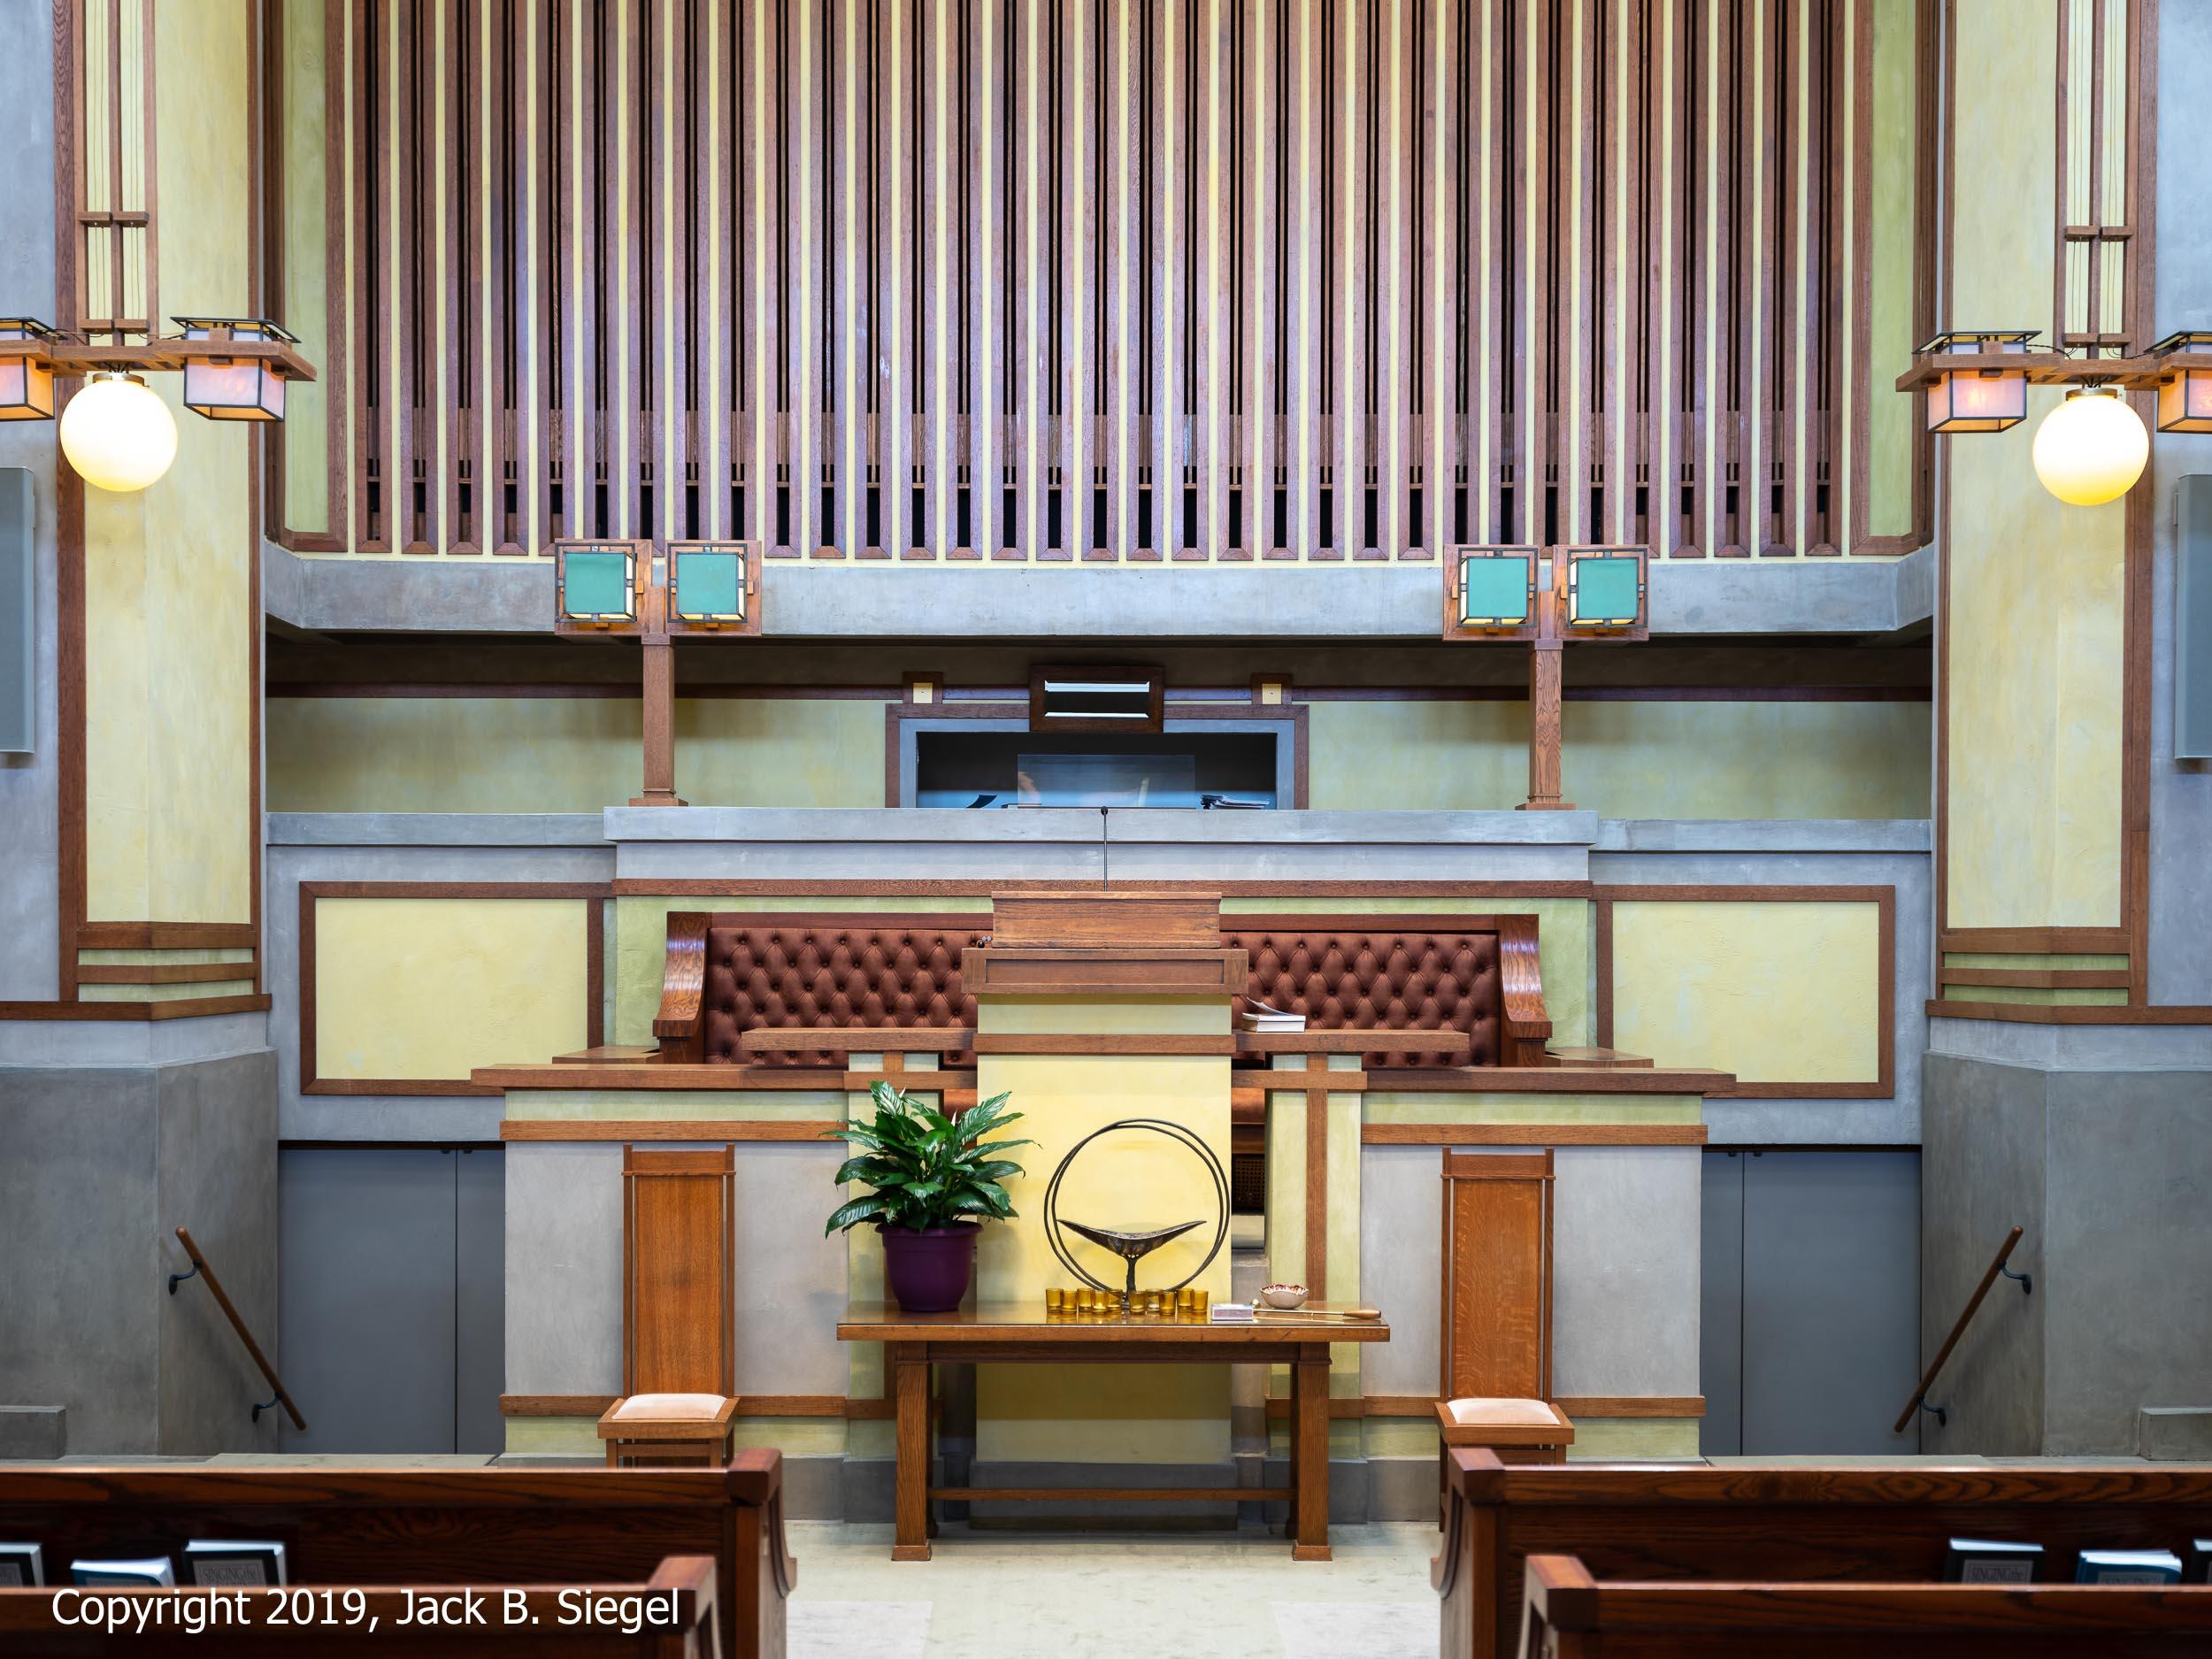 The Main Alter in Frank Lloyd Wright's Unity Temple (Oak Park)